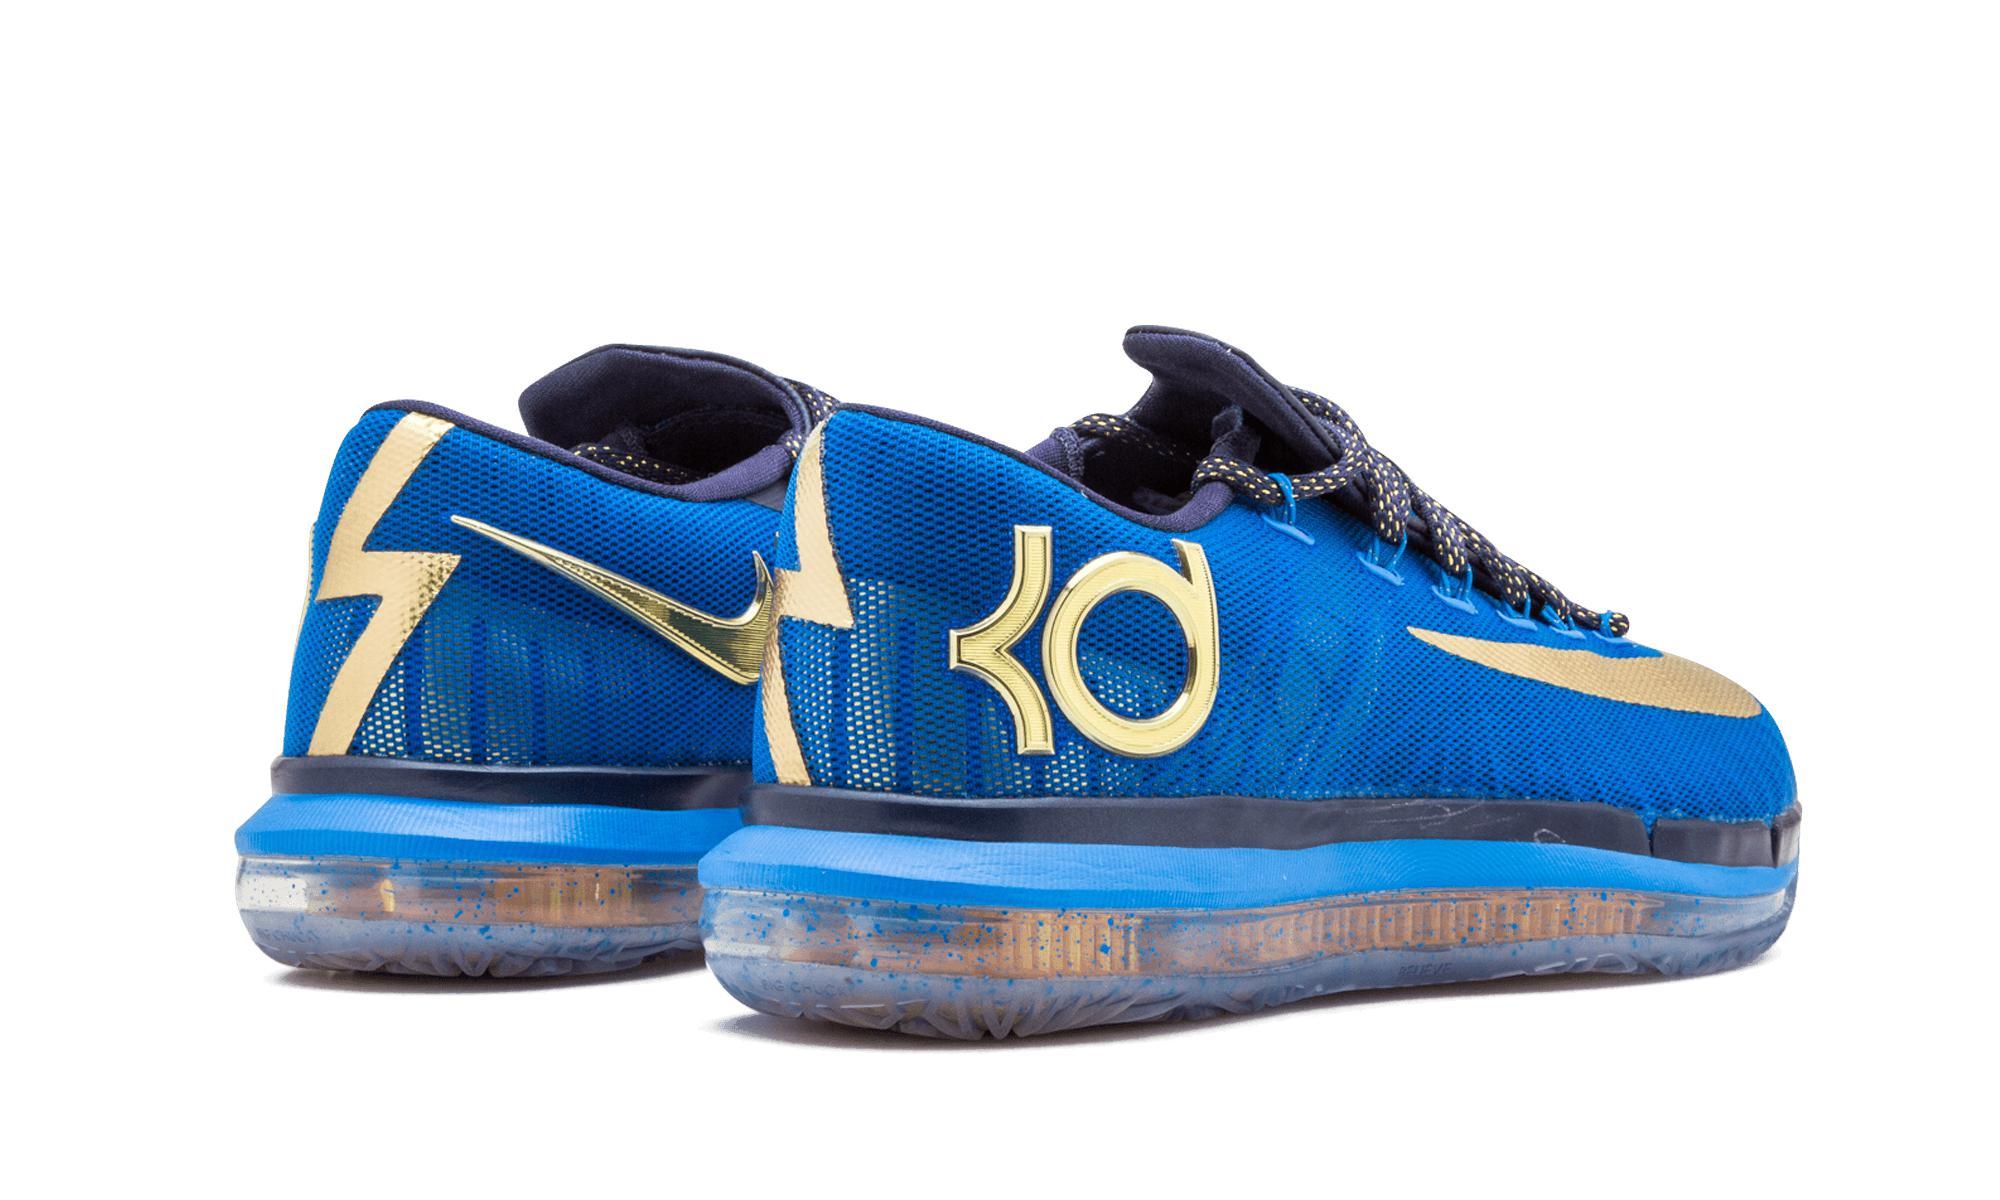 fbb9d2157bfc Nike - Kd 6 Elite Premium Photo Blue metallic Gold  supremacy  for Men.  View fullscreen